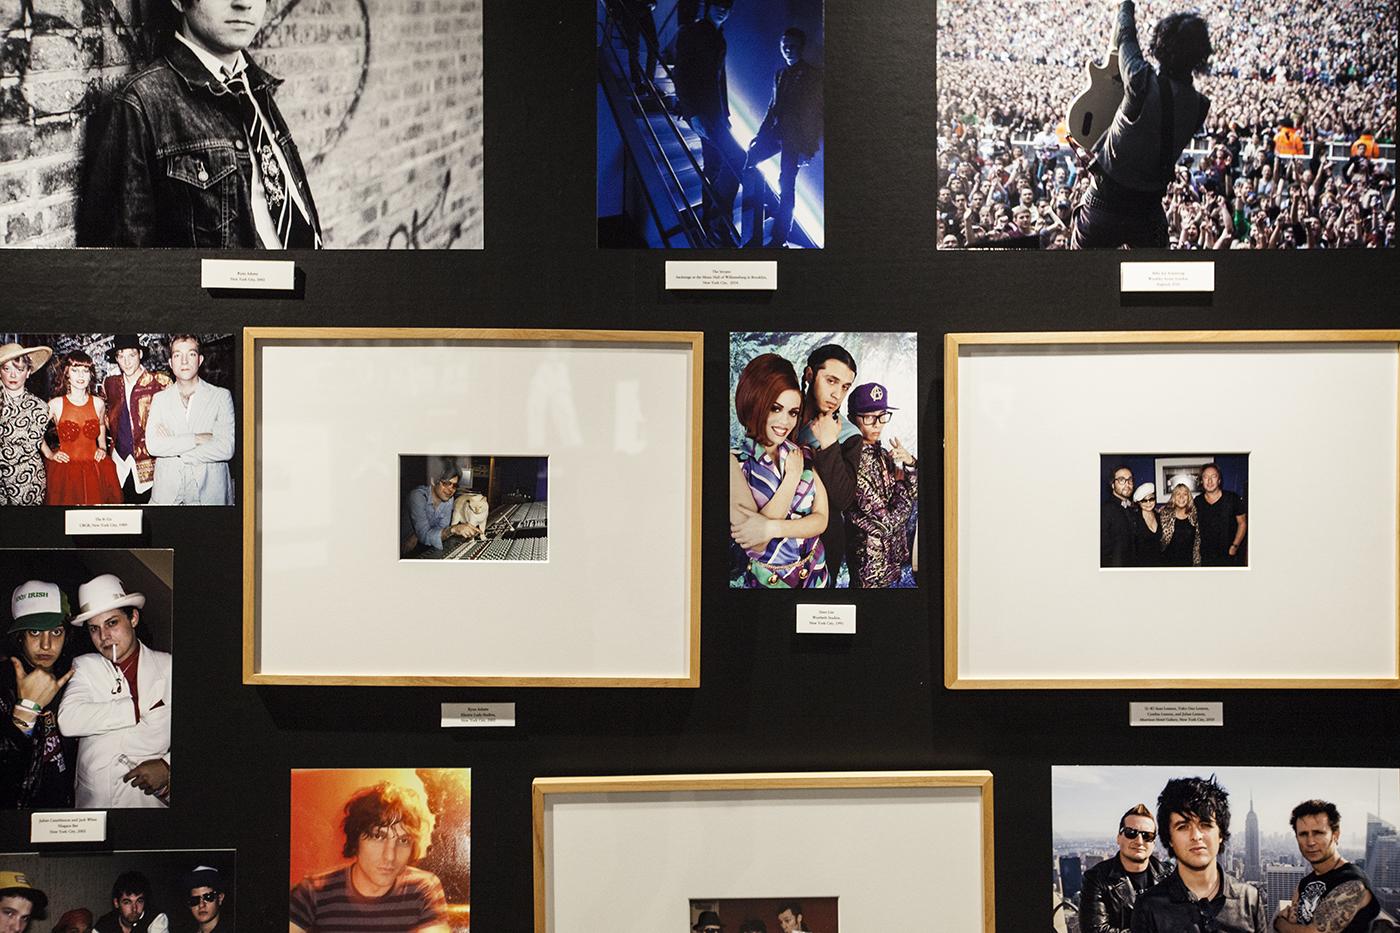 m-0105 【レポート】ロックの歴史が凝縮。フジロックファンも必見のボブ・グルーエン写真展